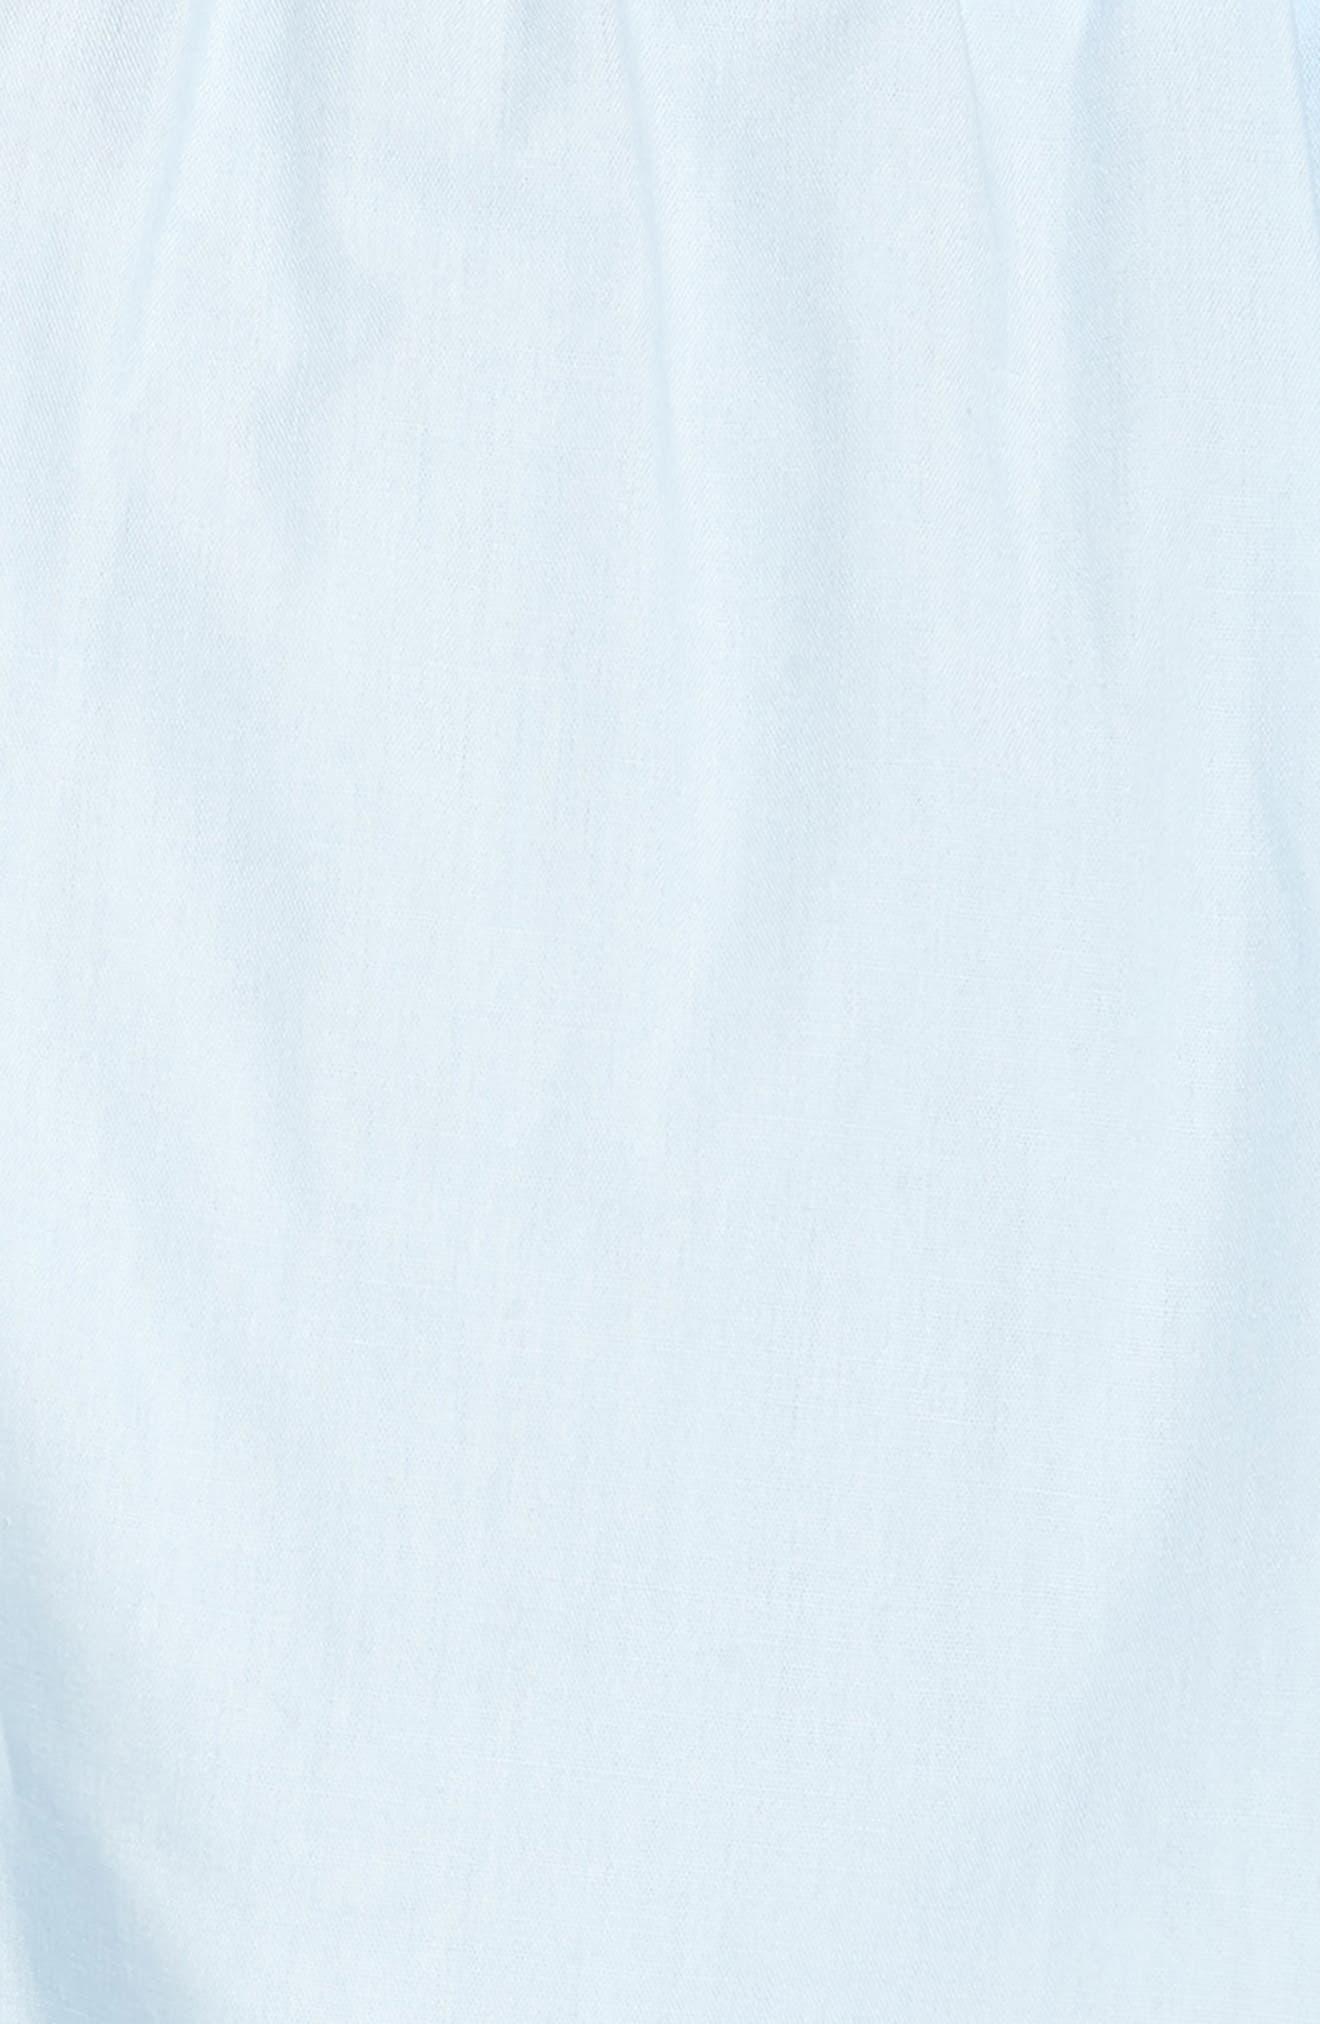 3-Pack Cotton Boxers,                             Alternate thumbnail 6, color,                             WHITE/ LIGHT BLUE/ CRUISE NAVY